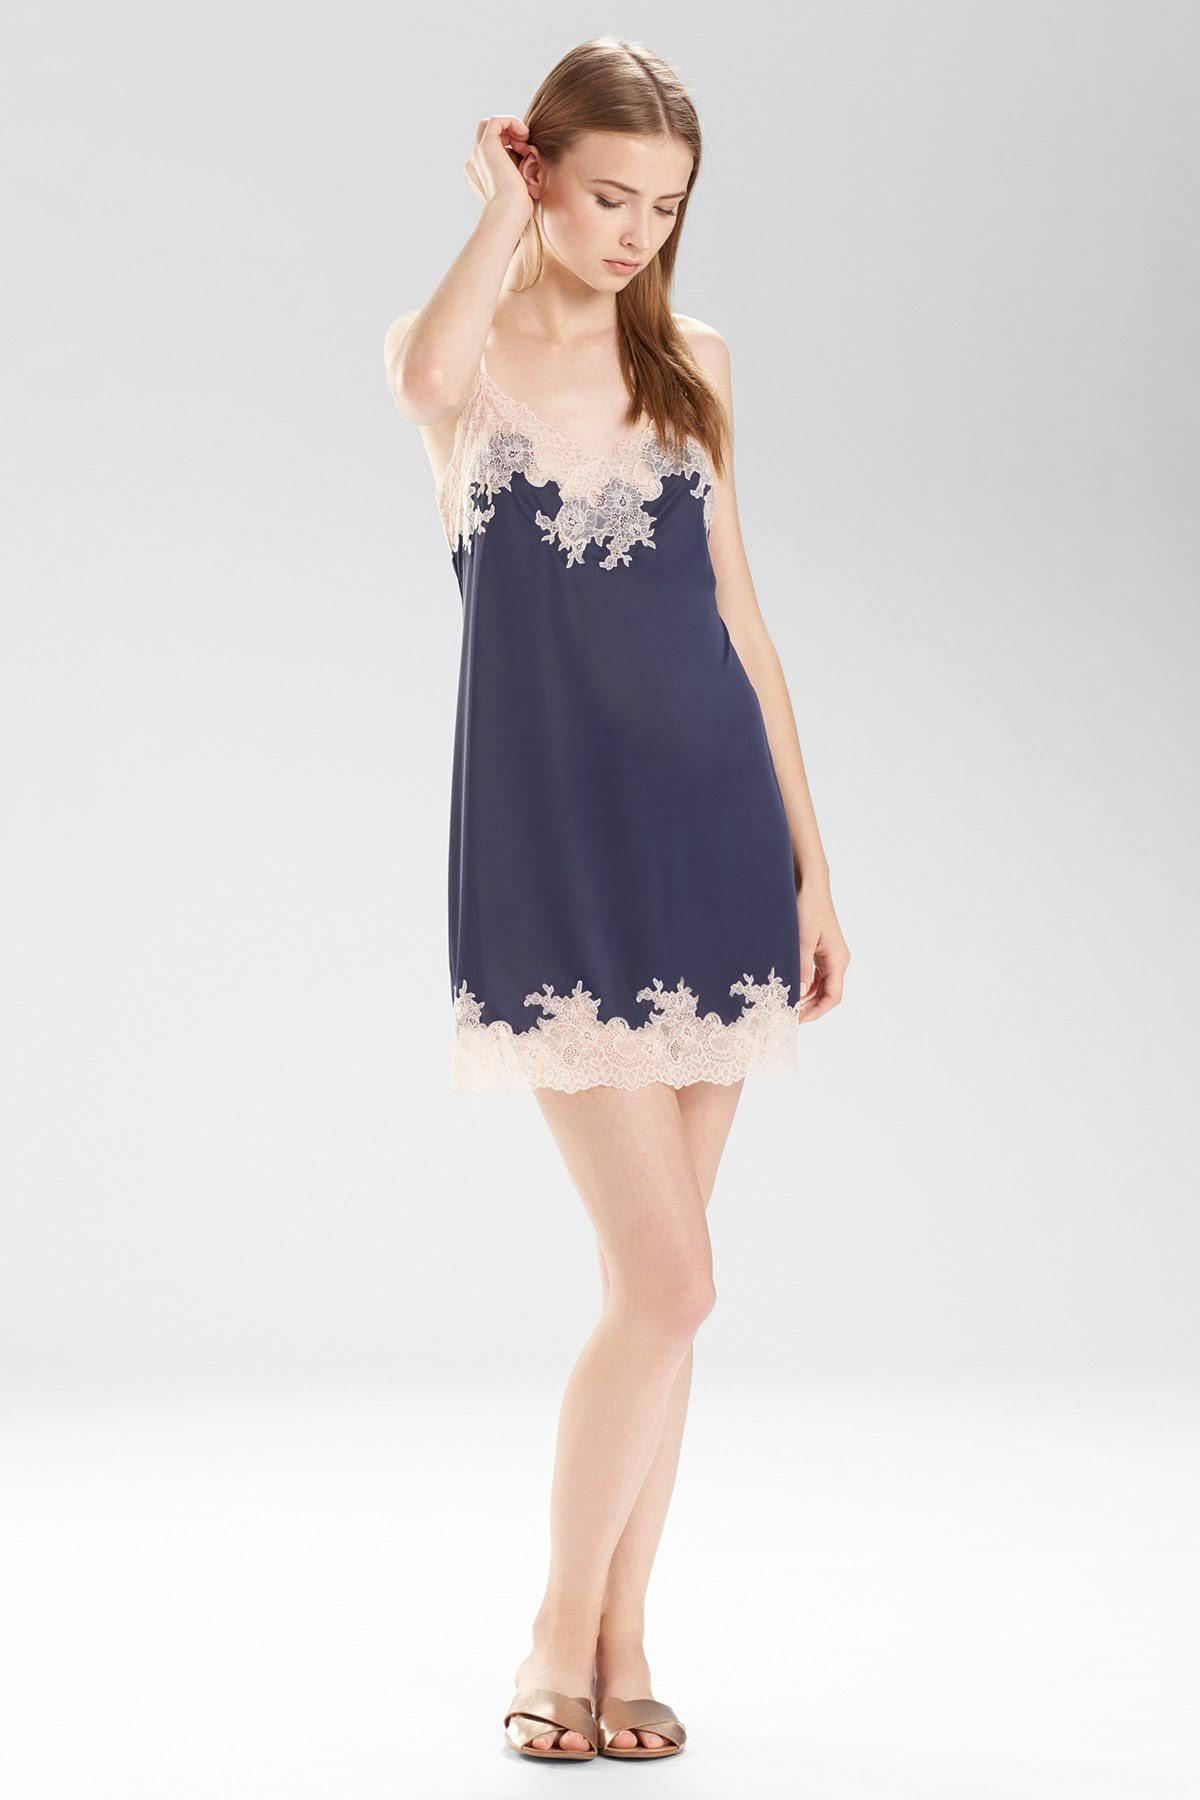 Natori Ribete Con De Encaje Azul Noche Xs Rosa Chemise Mujeres Múltiple Enchant HUqrxw6HT